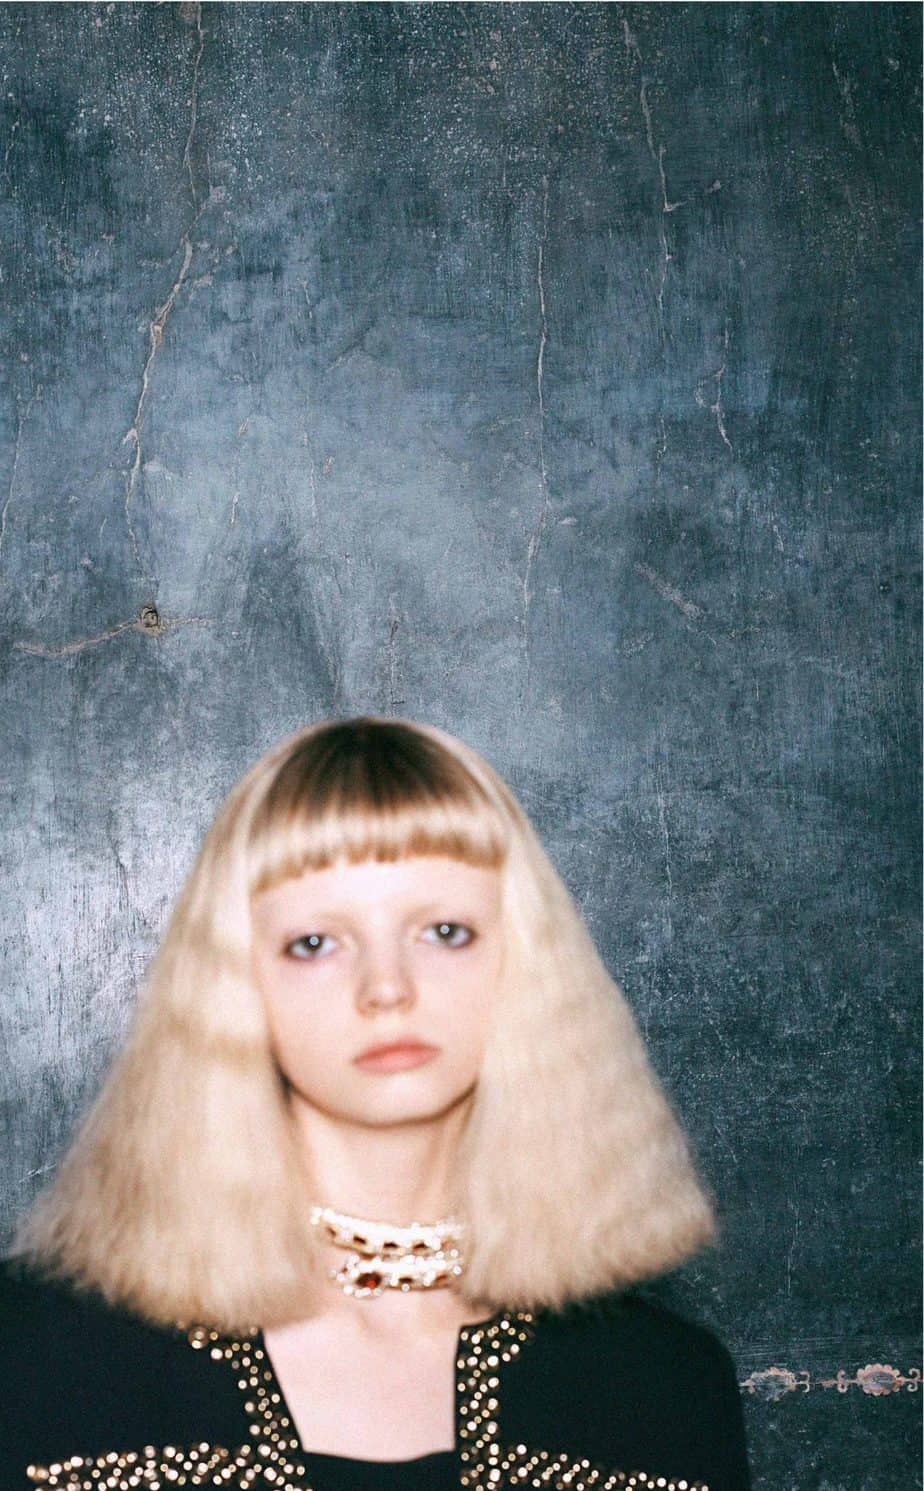 GUCCI, FALL 2019. WOMEN'S FASHION, Photographer Harmony Korine, Art Director, Christopher Simmonds - 35